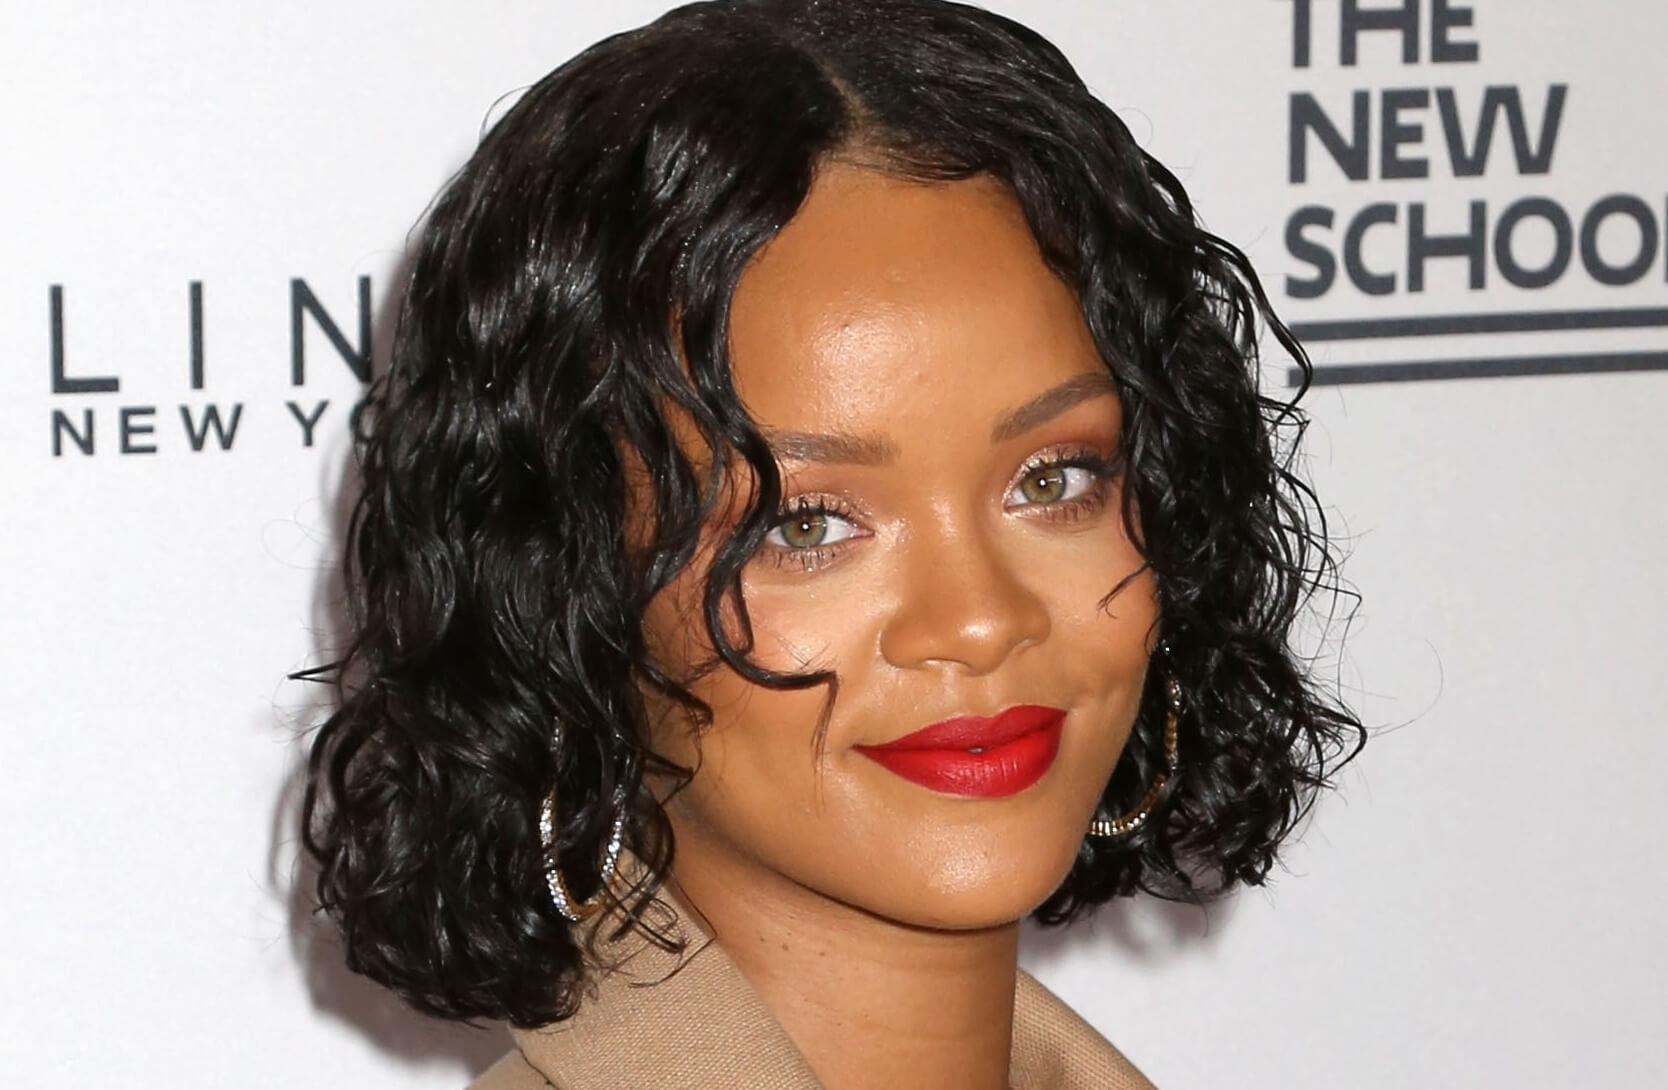 Makeup For Hazel Eyes: How To Make Them Pop regarding Makeup For Hazel Eyes And Black Hair